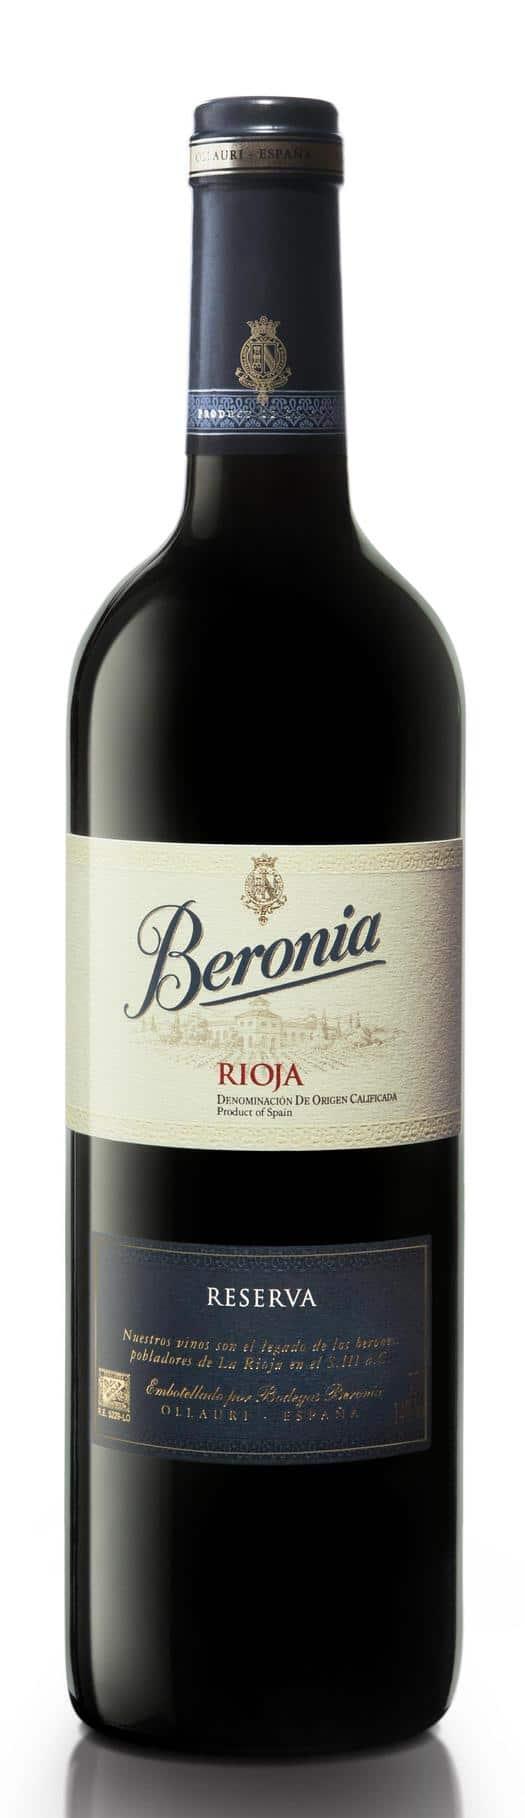 2010 Beronia Rioja Reserva